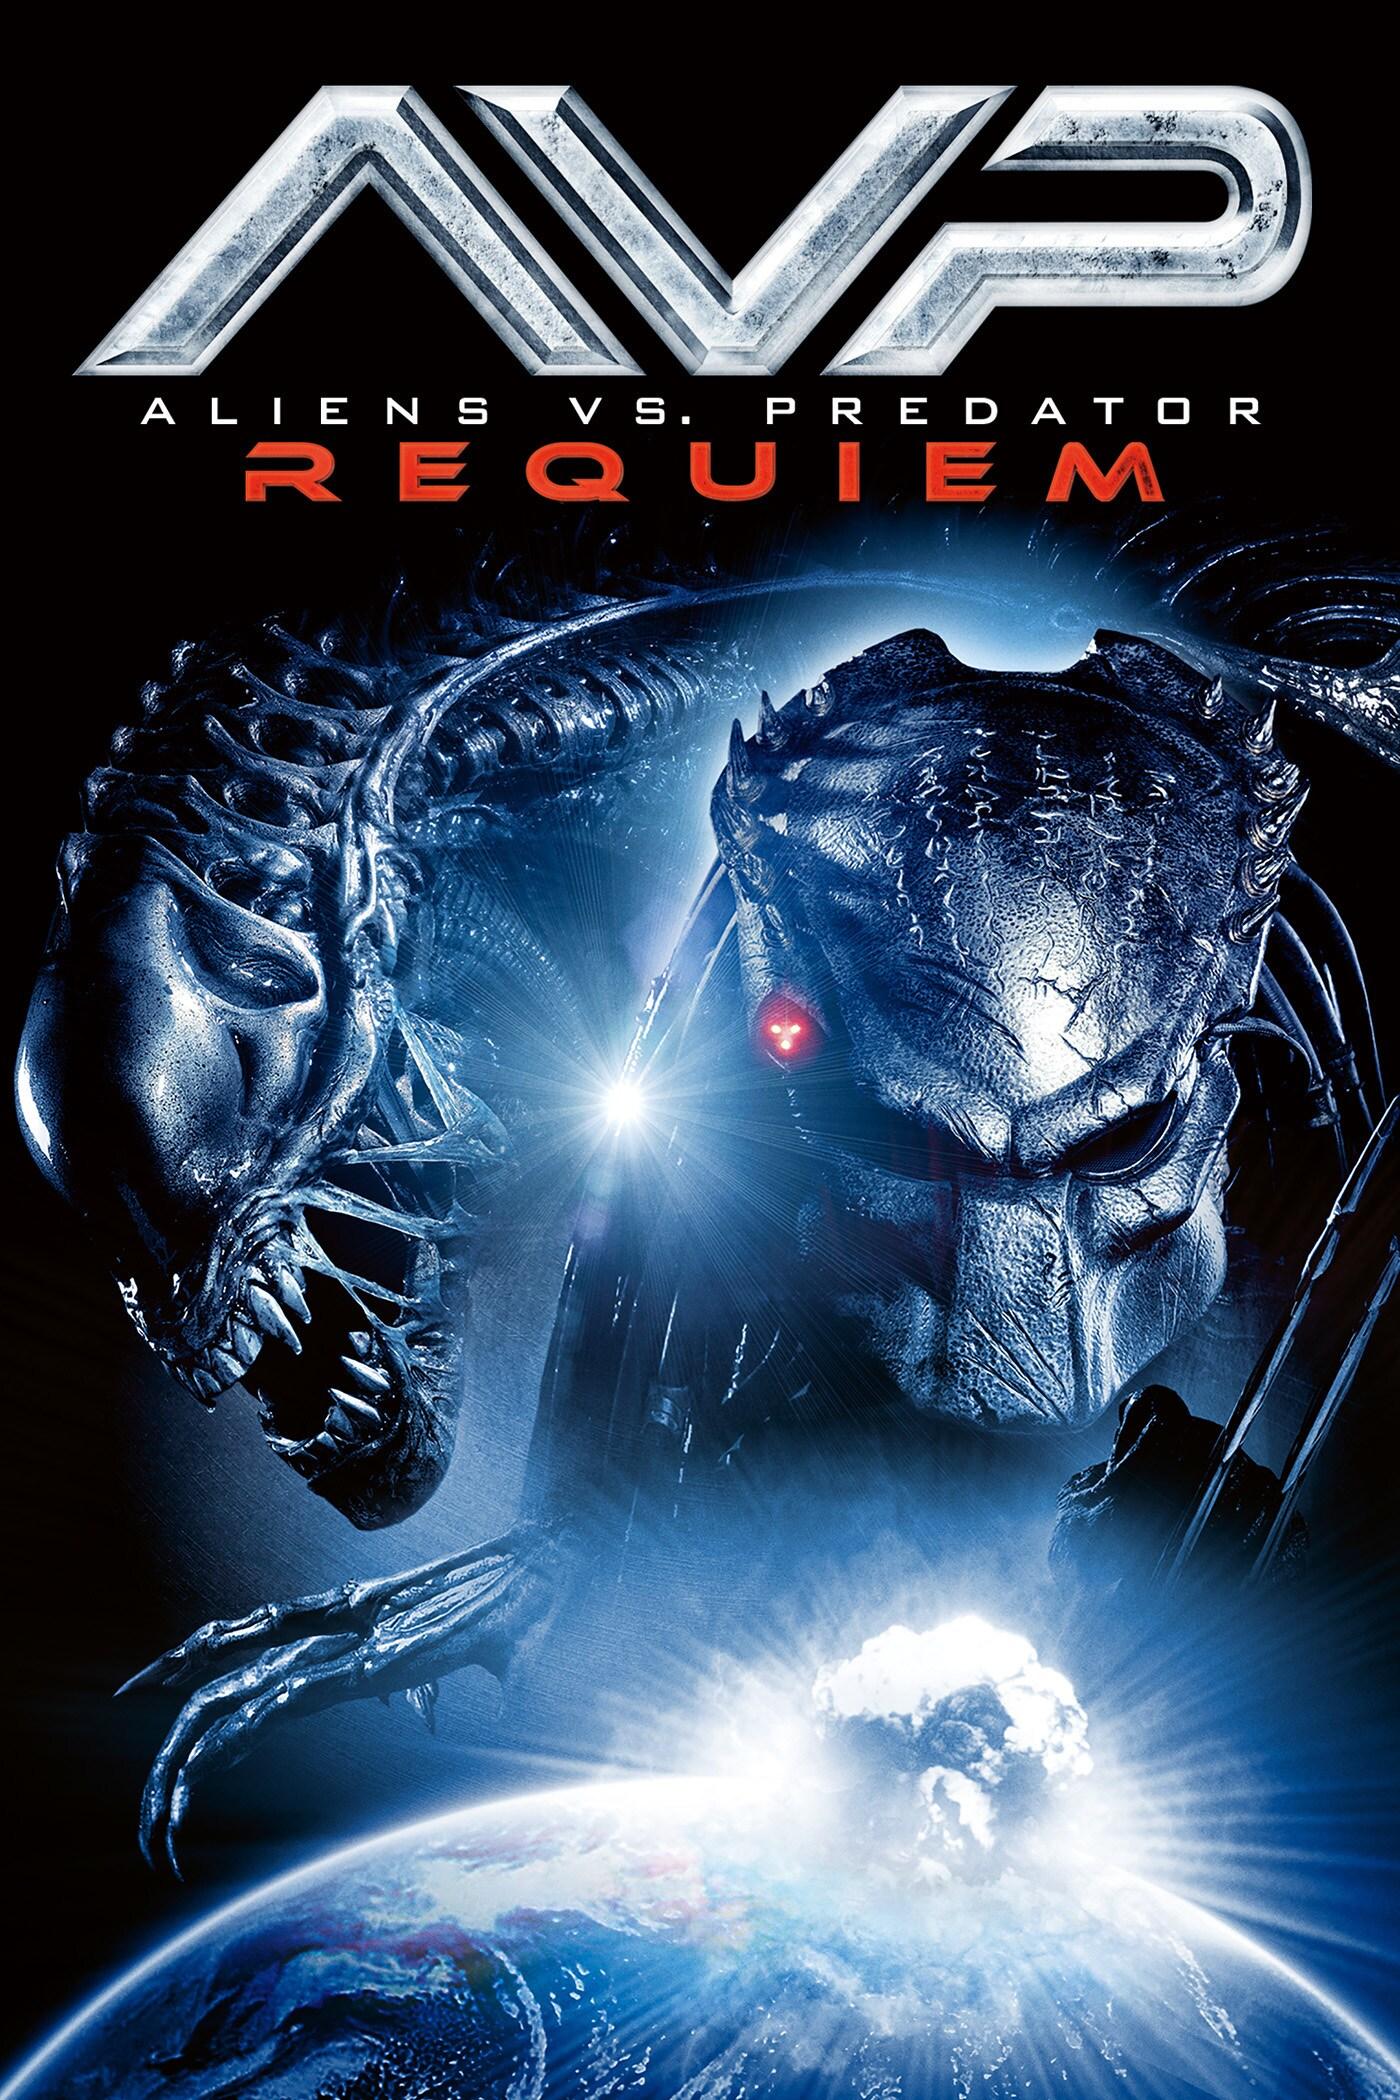 AVP: Aliens vs. Predator - Requiem movie poster